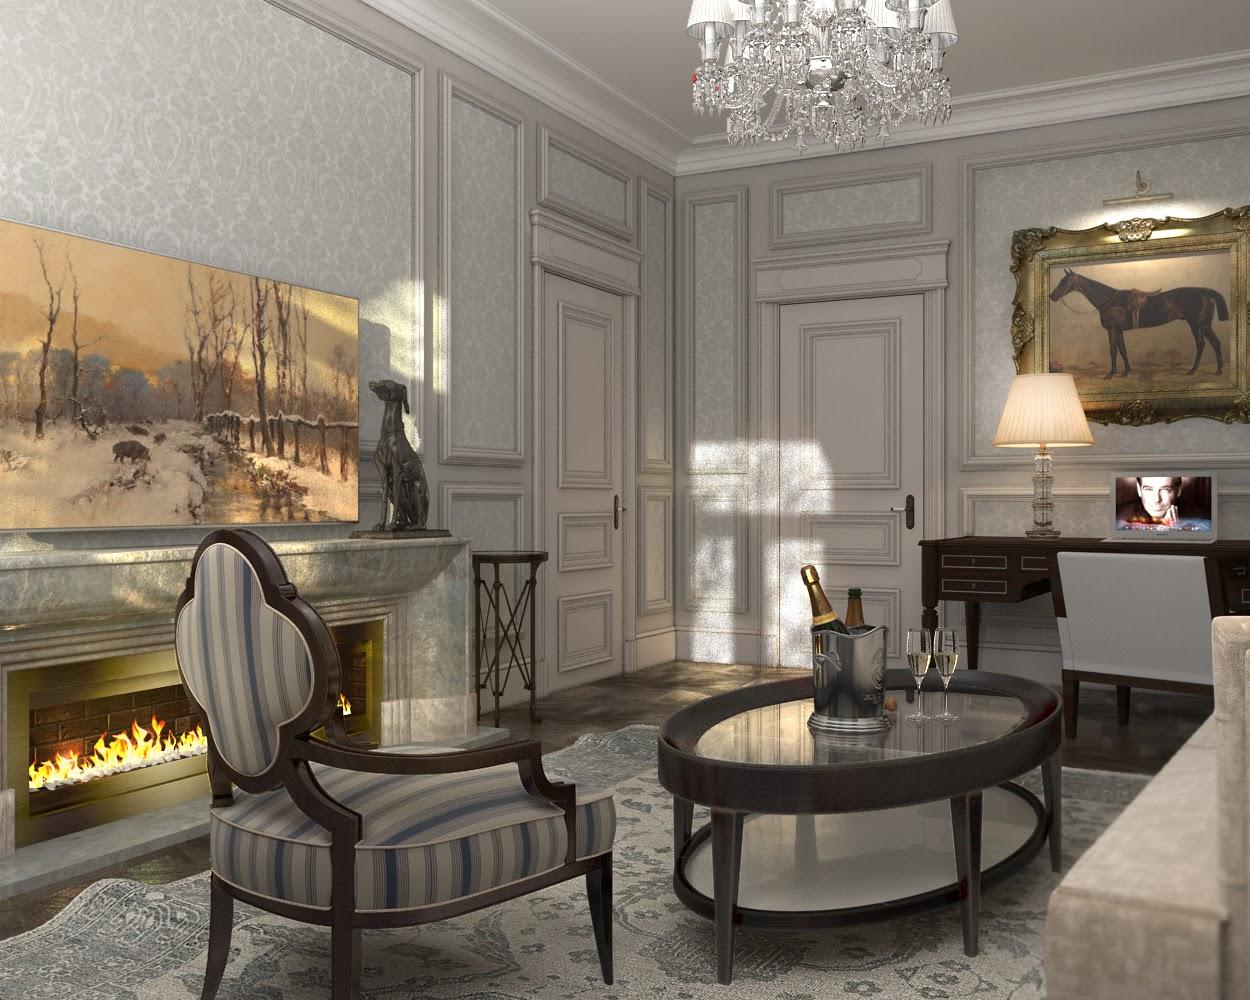 Darya girina interior design interior design of lux for Luxe interieur design